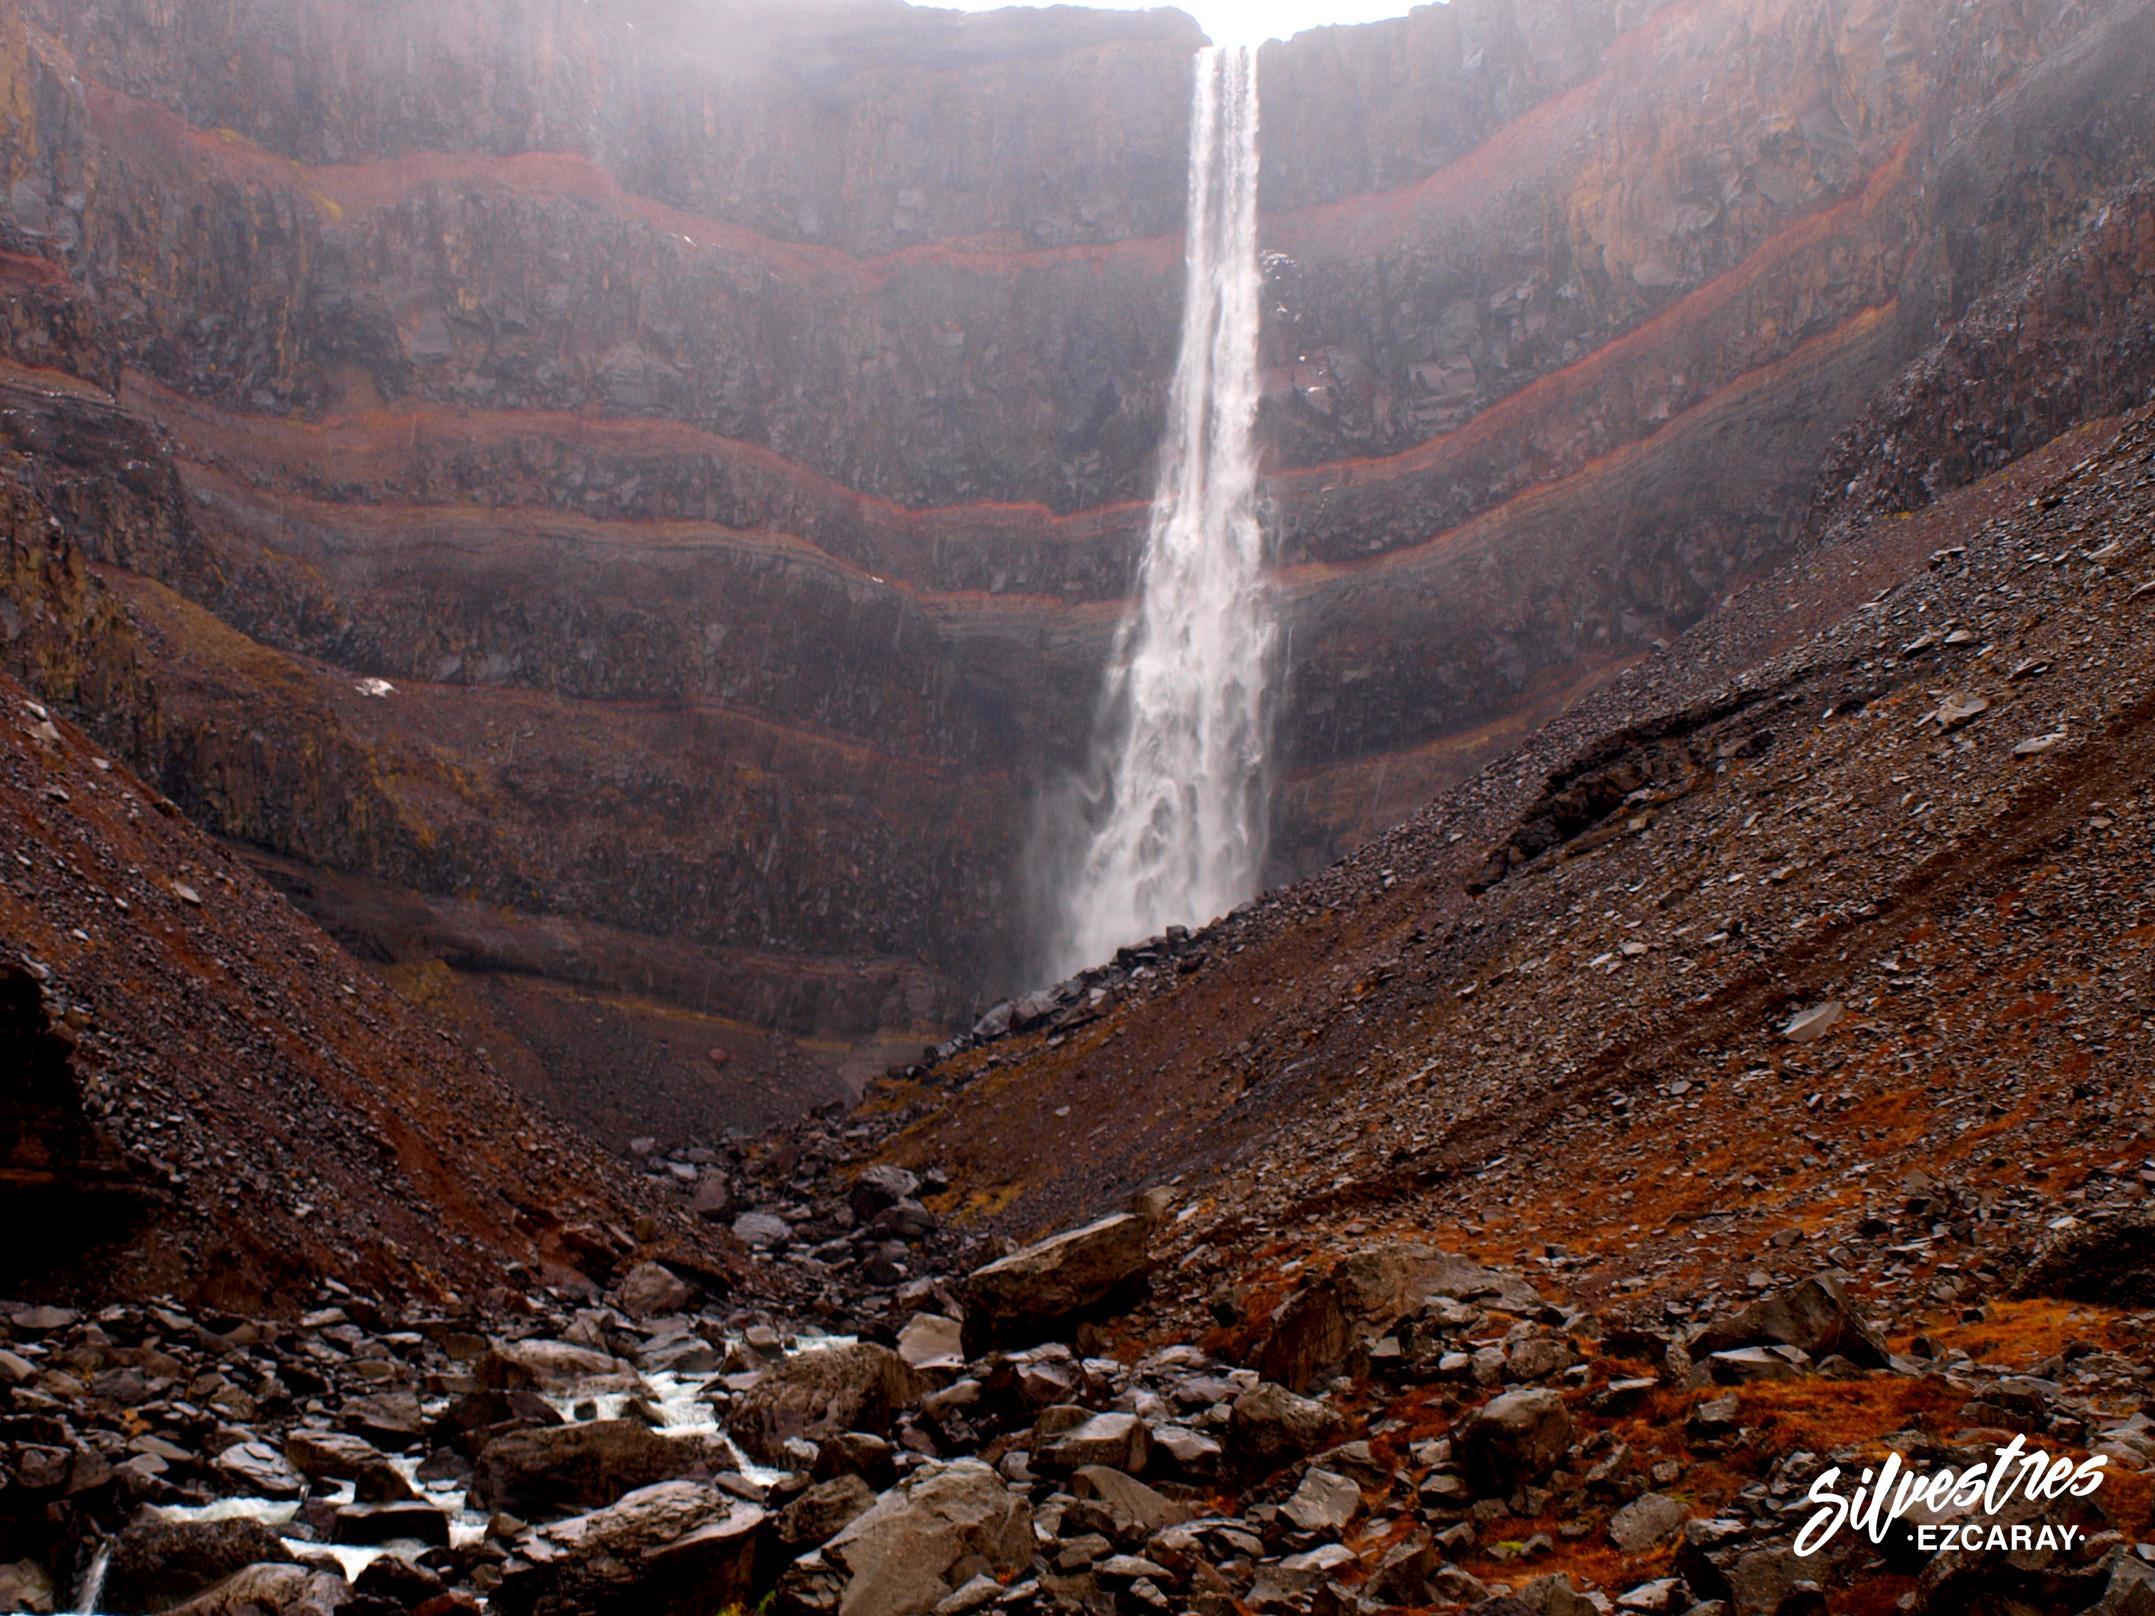 geología_islandia_cascada_hengifoss_geology_waterfall_iceland_estratos_rojos